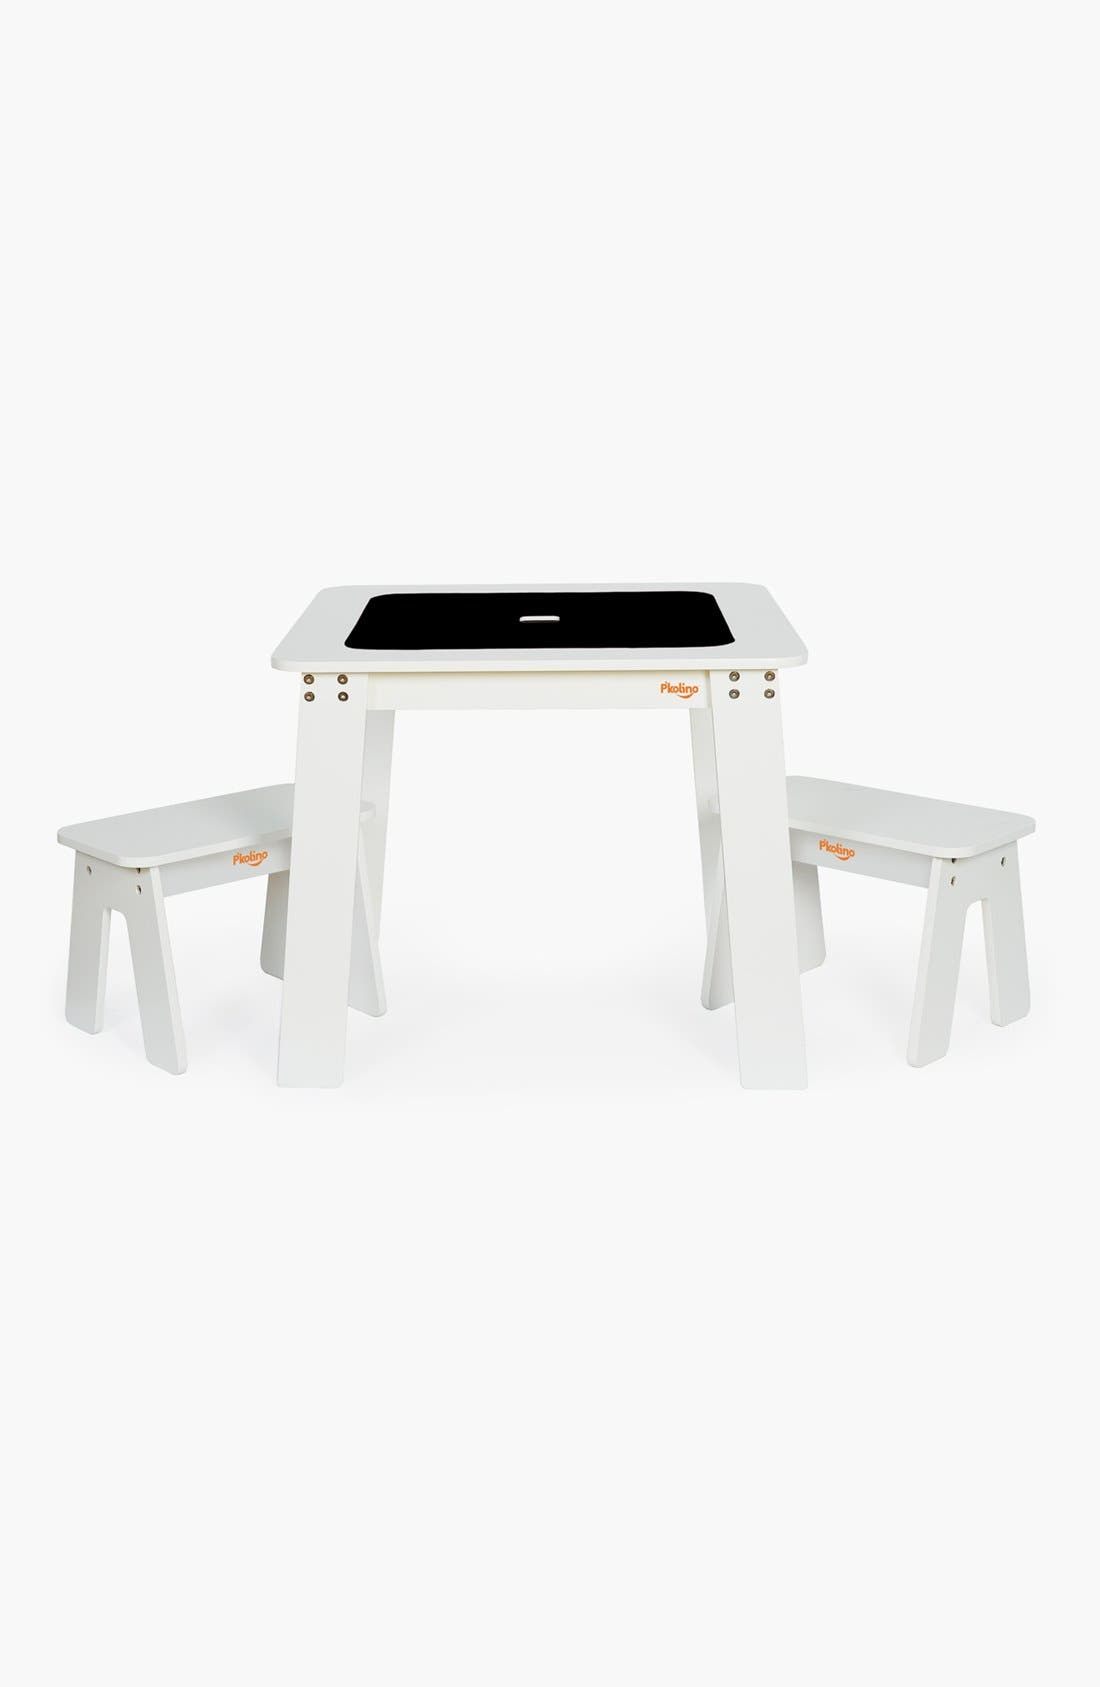 Alternate Image 1 Selected - P'kolino Art Table & Benches (Toddler)